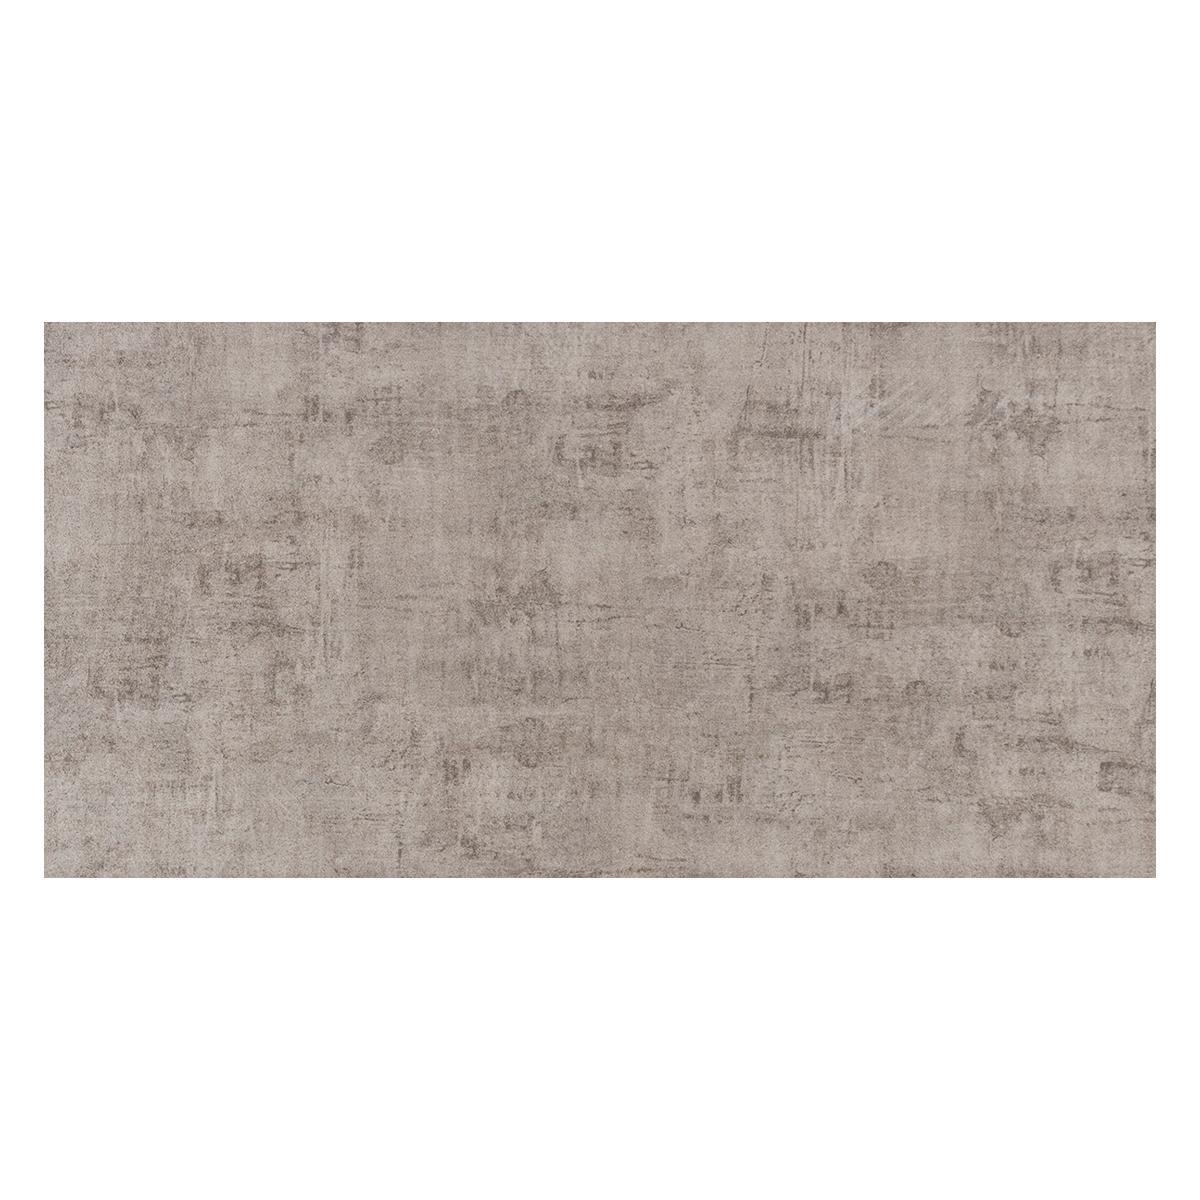 Porcelanato Dakota Gris Mate - 40X80 cm - 1.92 m2